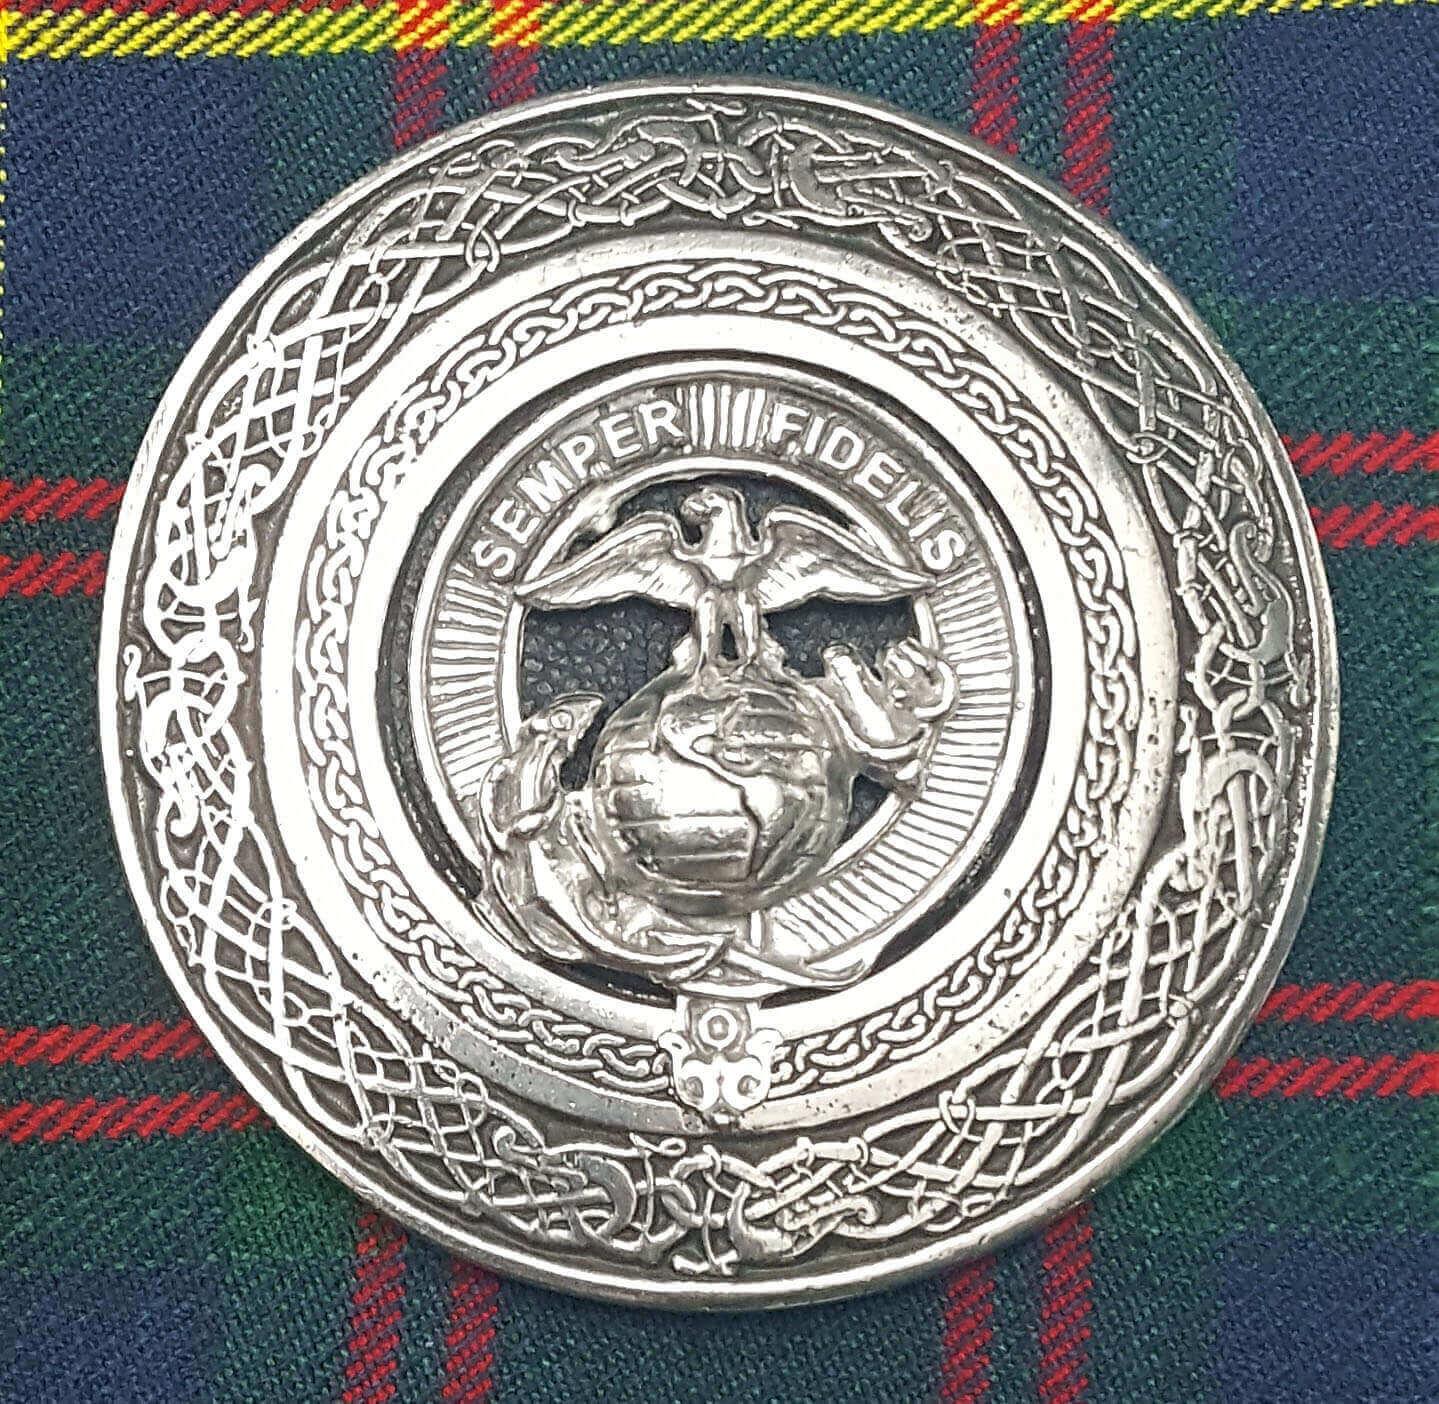 U.S. Marine Corps Round Kilt Belt Buckle